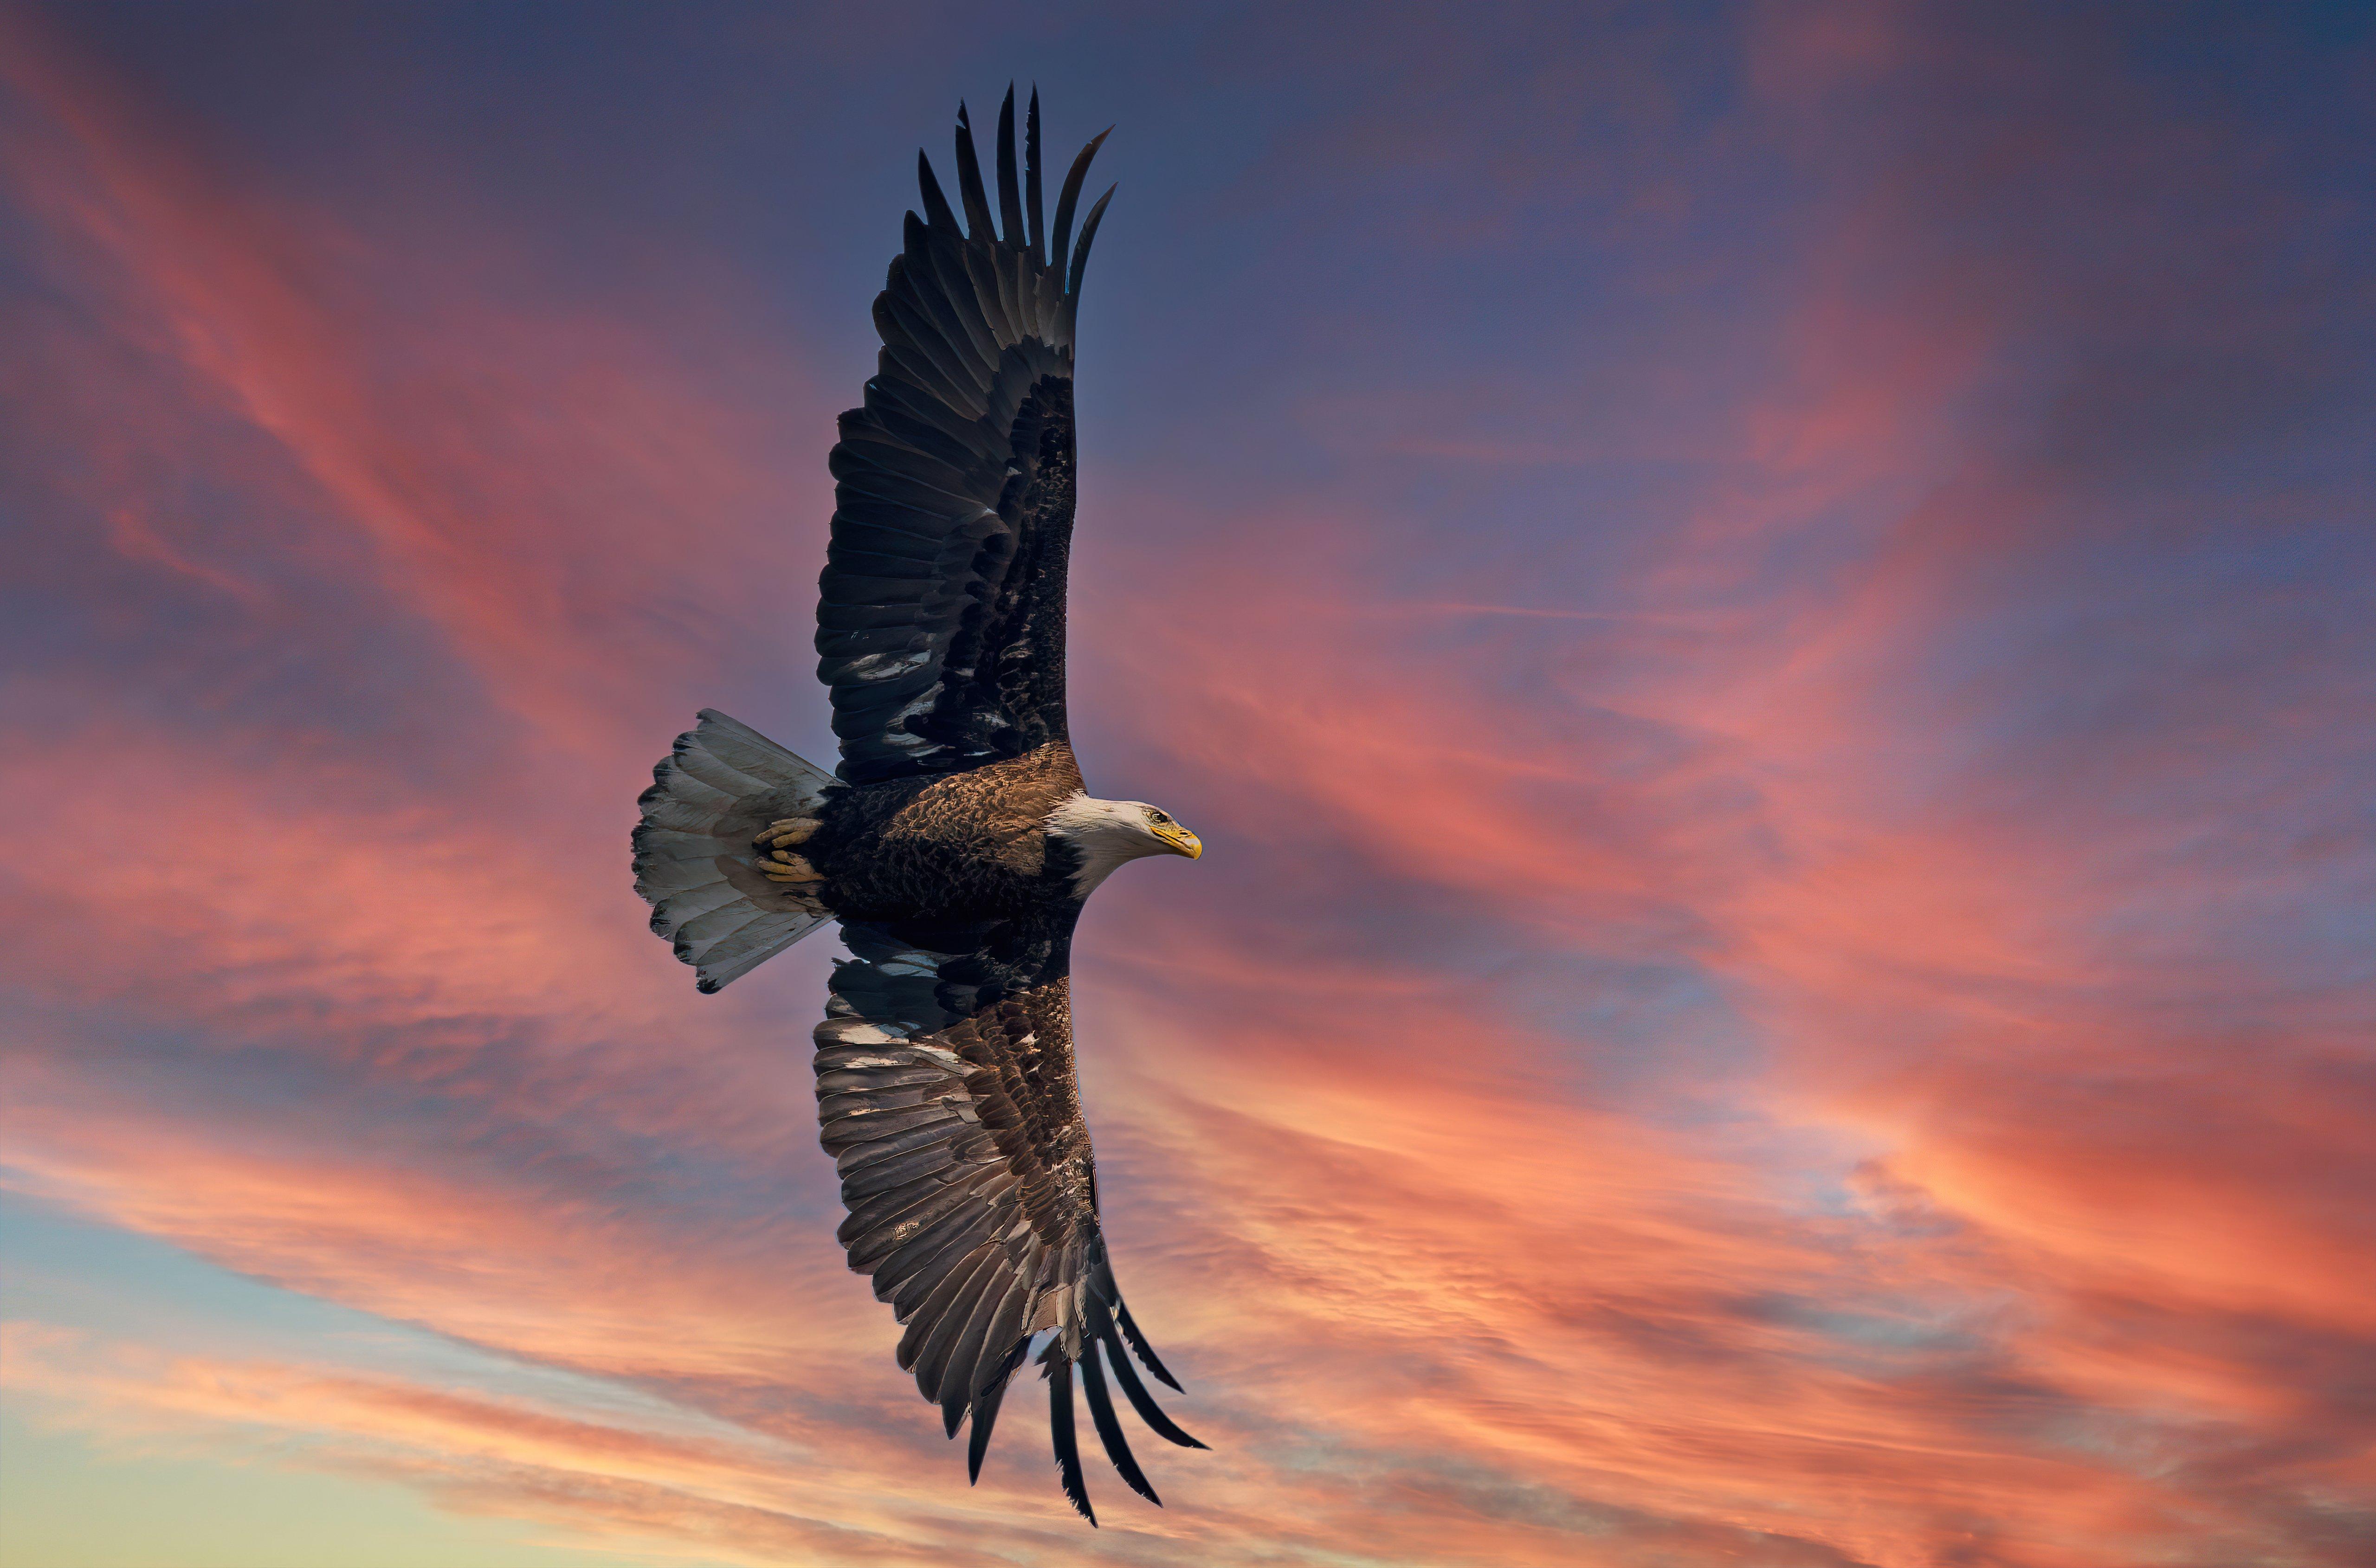 Fondos de pantalla Águila calva con alas abiertas